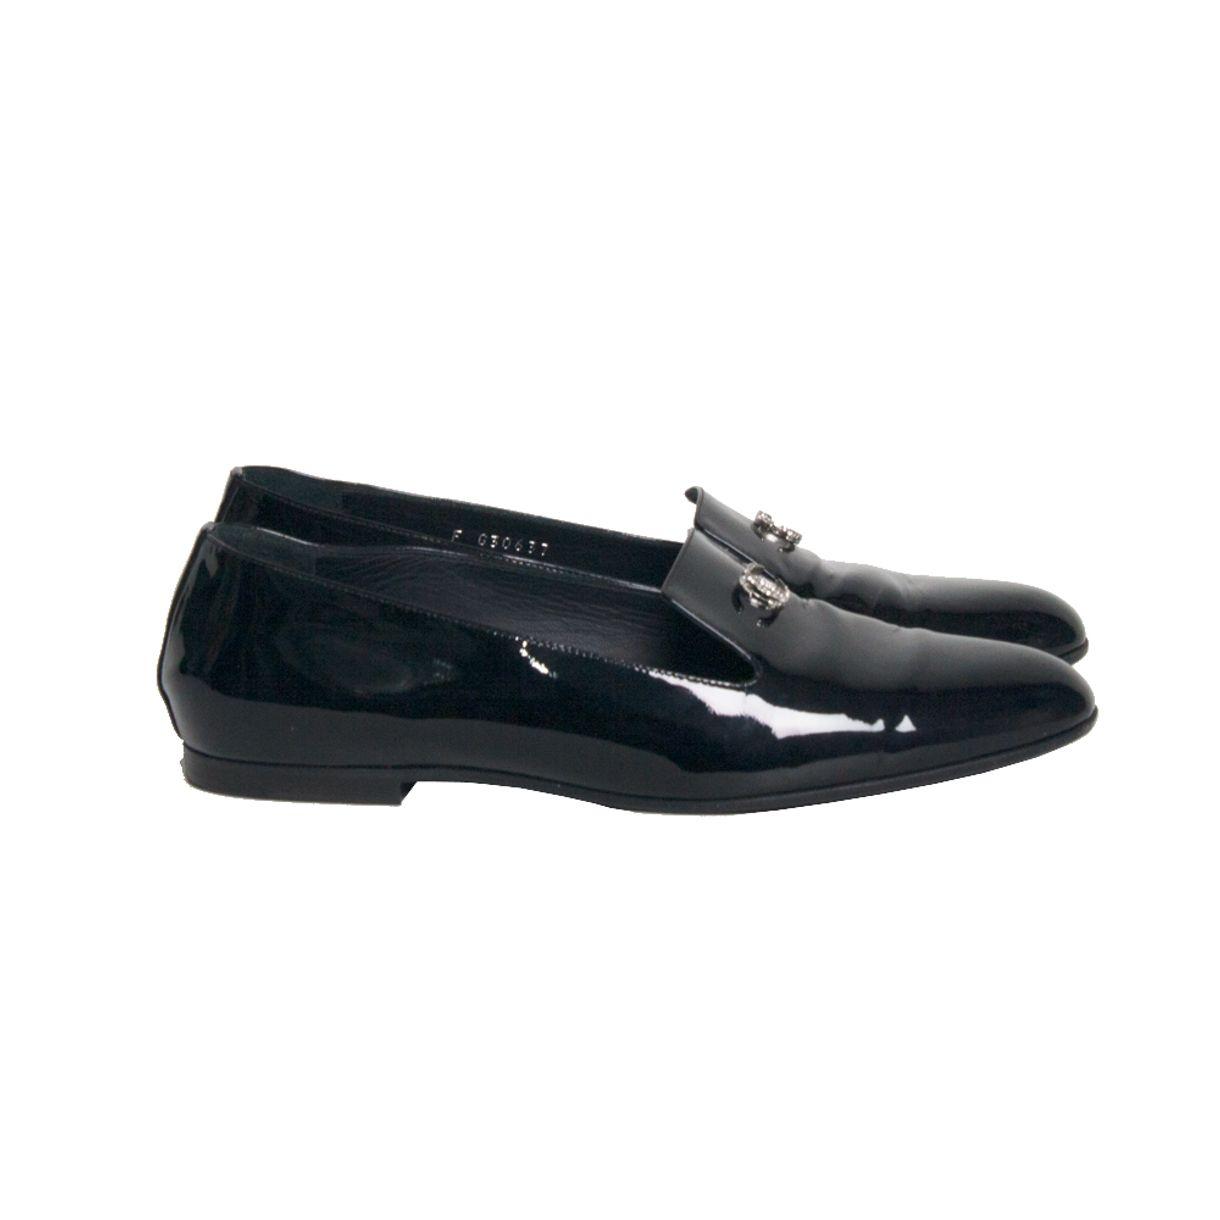 Loafer-Chanel-Patent-Verniz-Preto